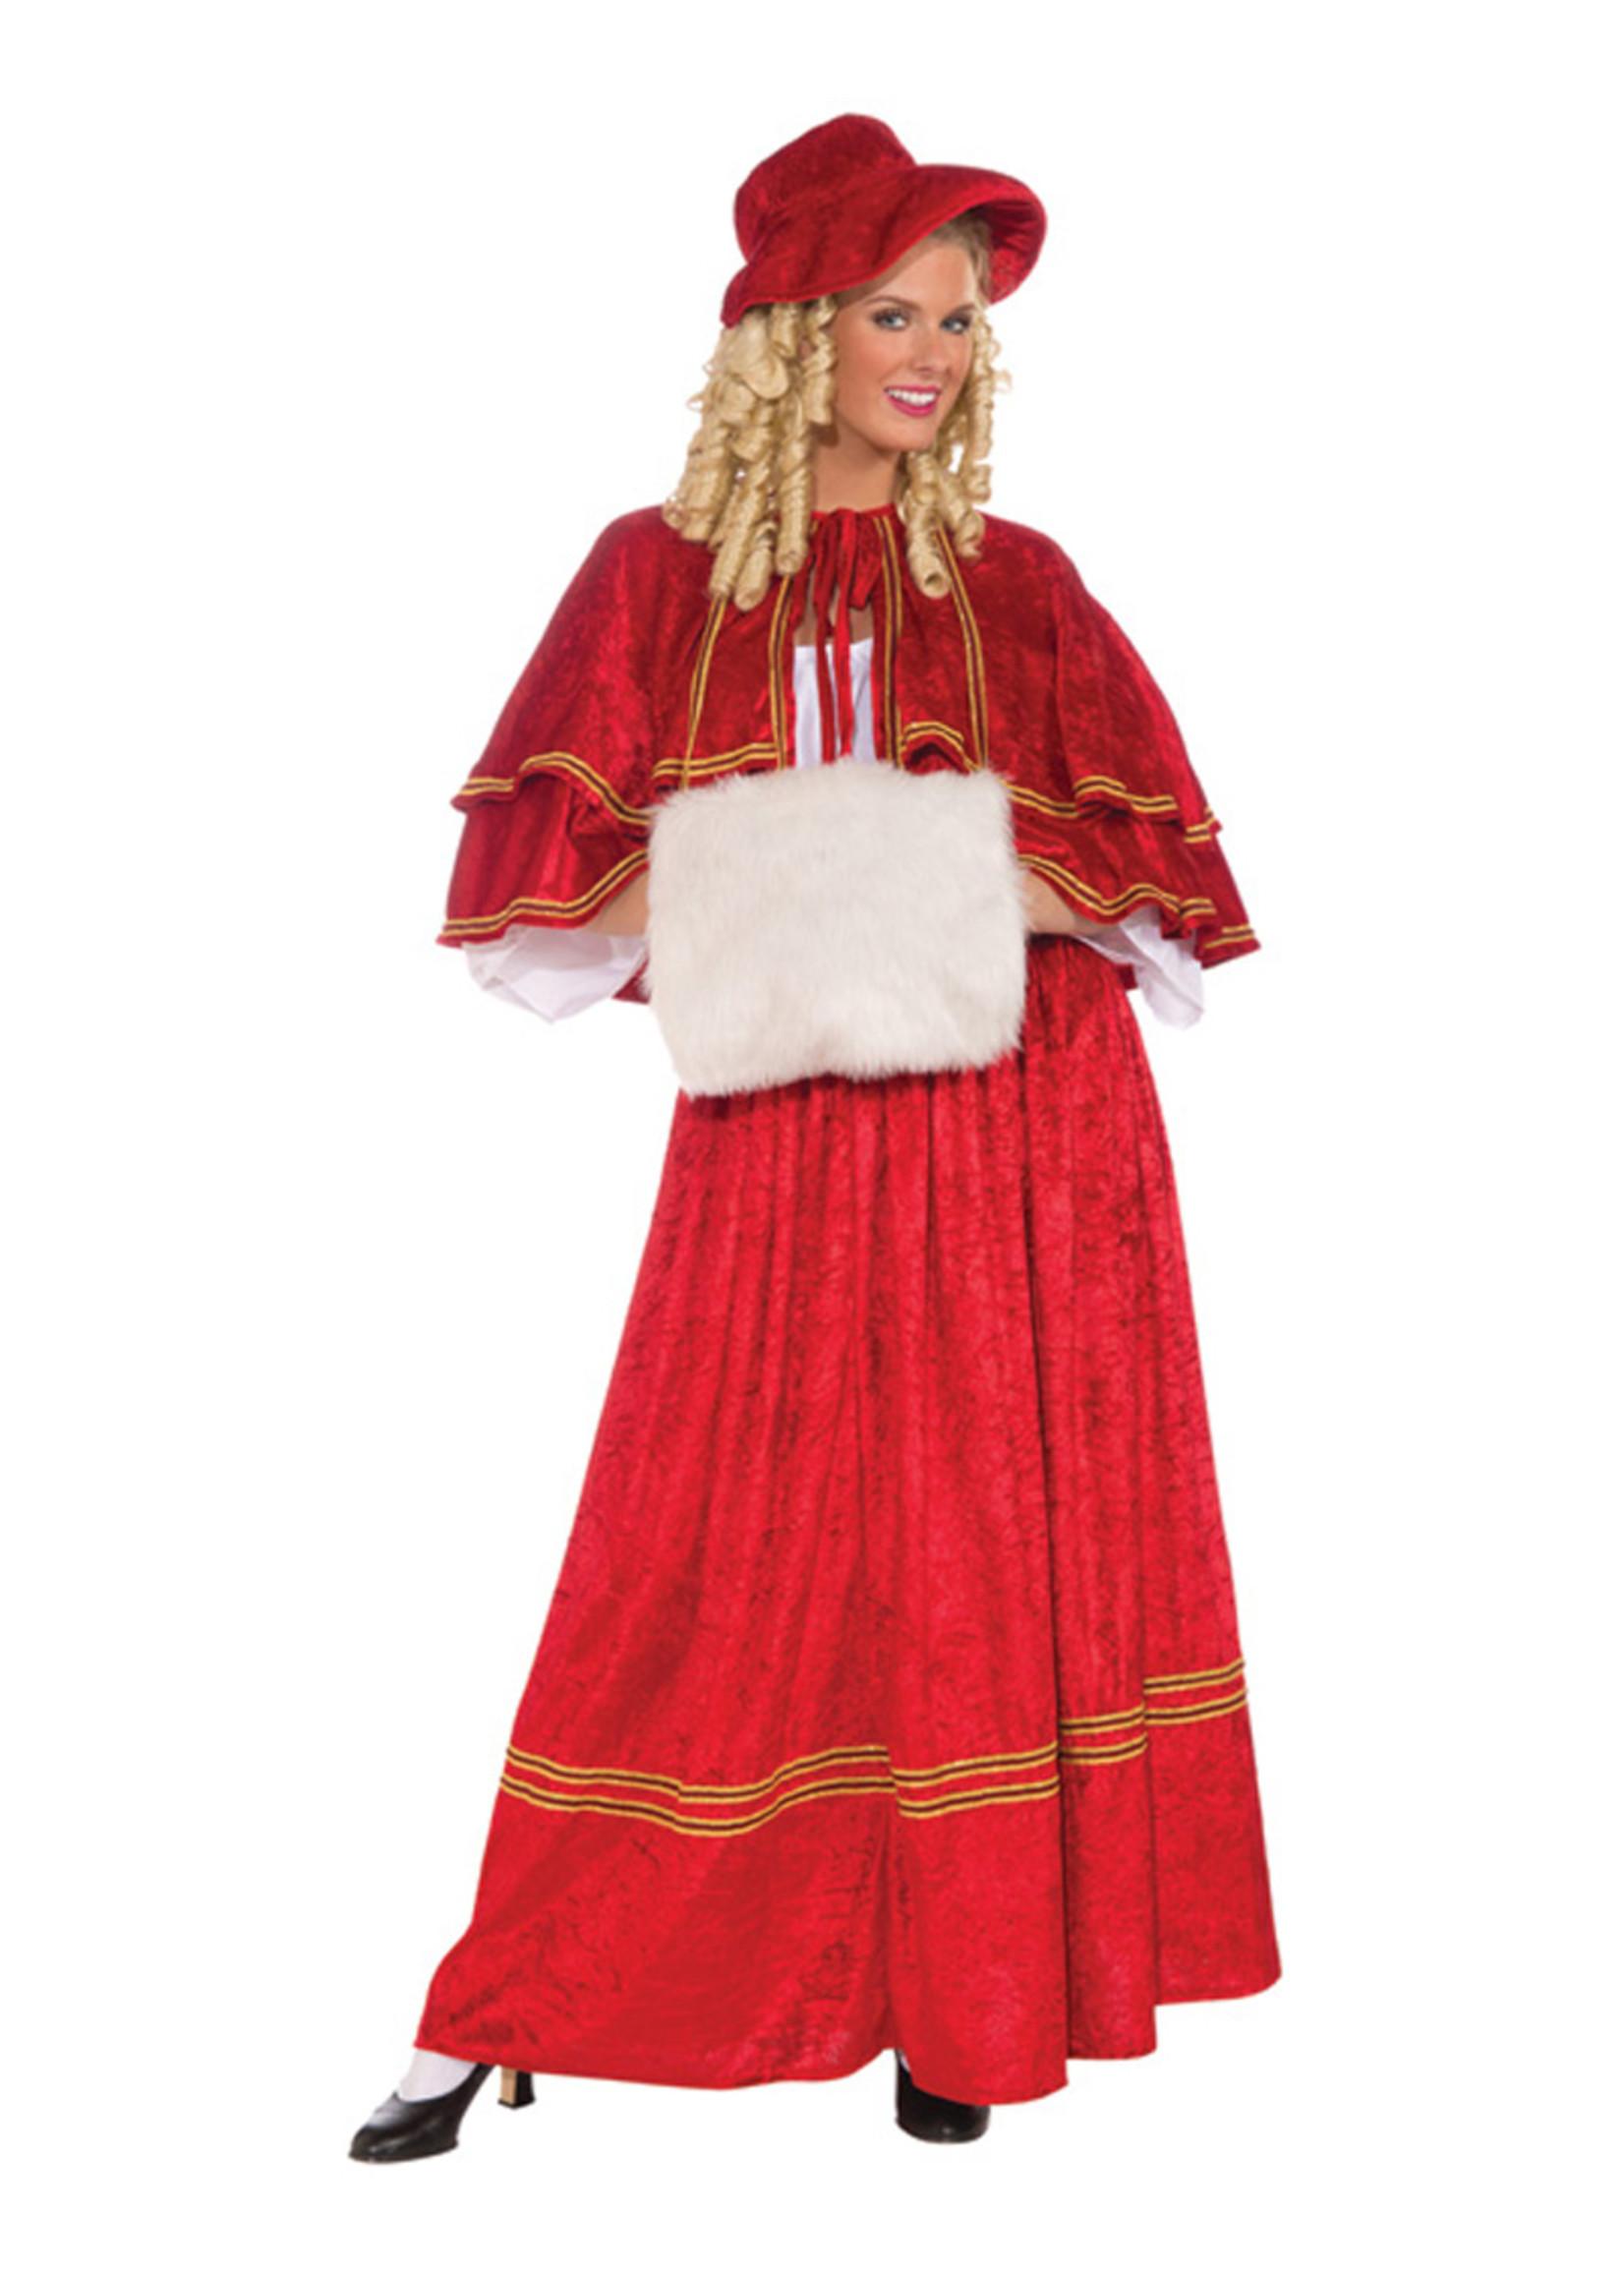 Christmas Caroler Costume - Women's